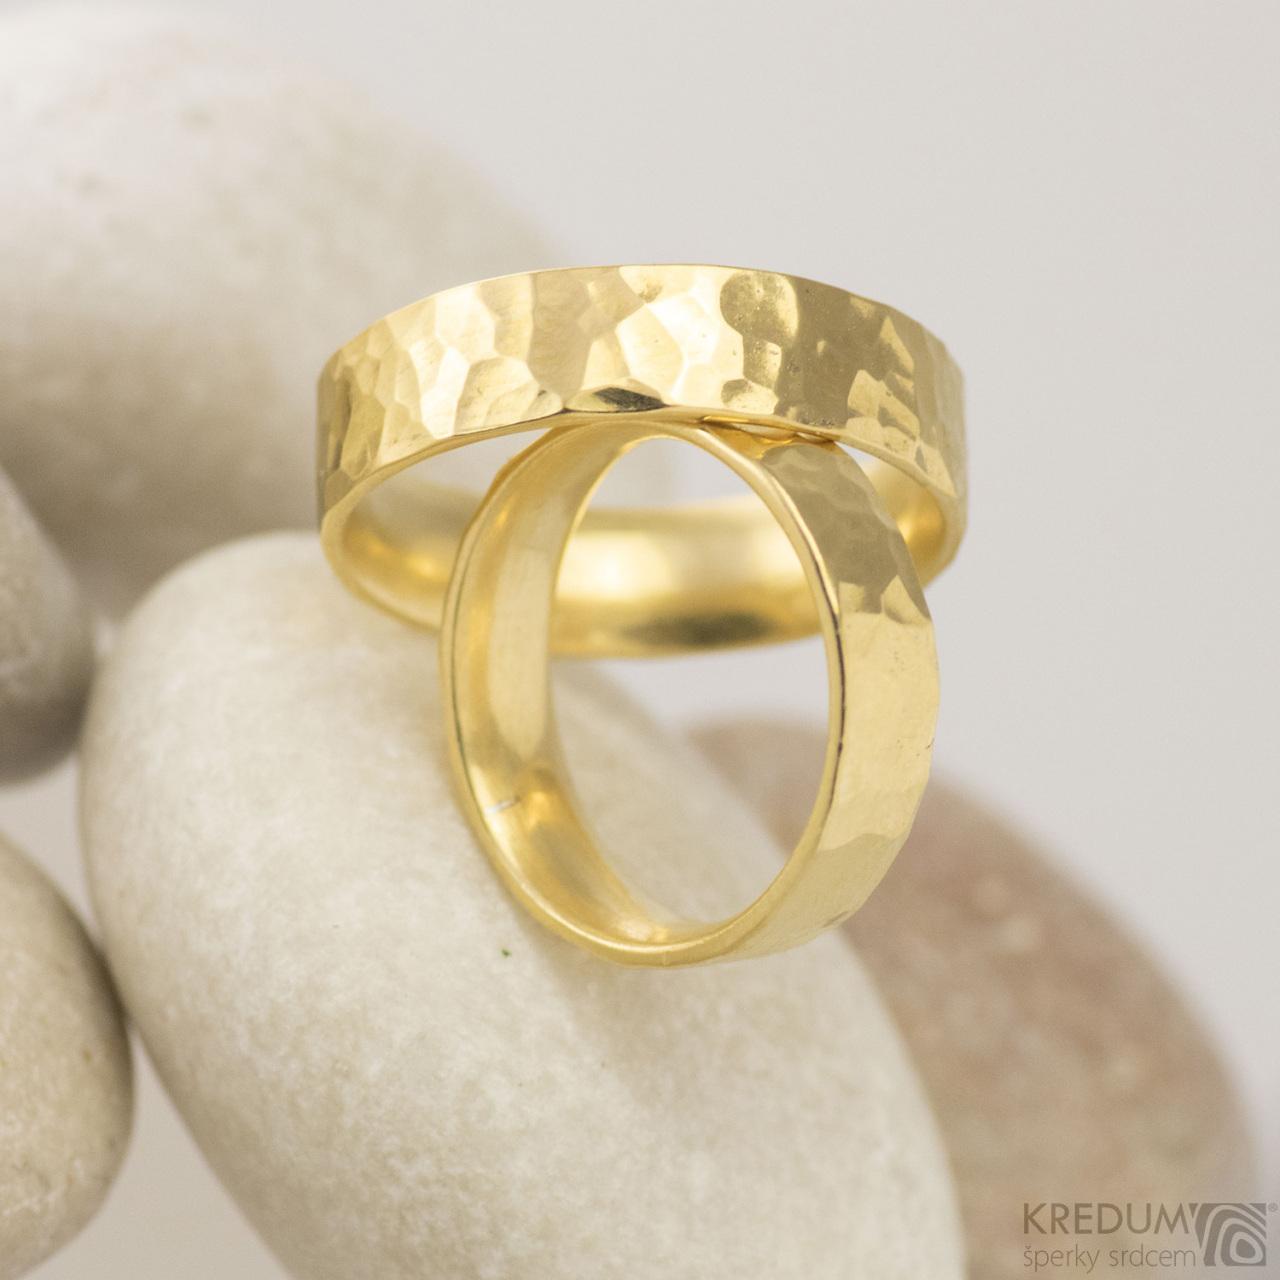 Golden Draill Yellow Zlaty Snubni Prsten Vyroba Hand Made Snubni